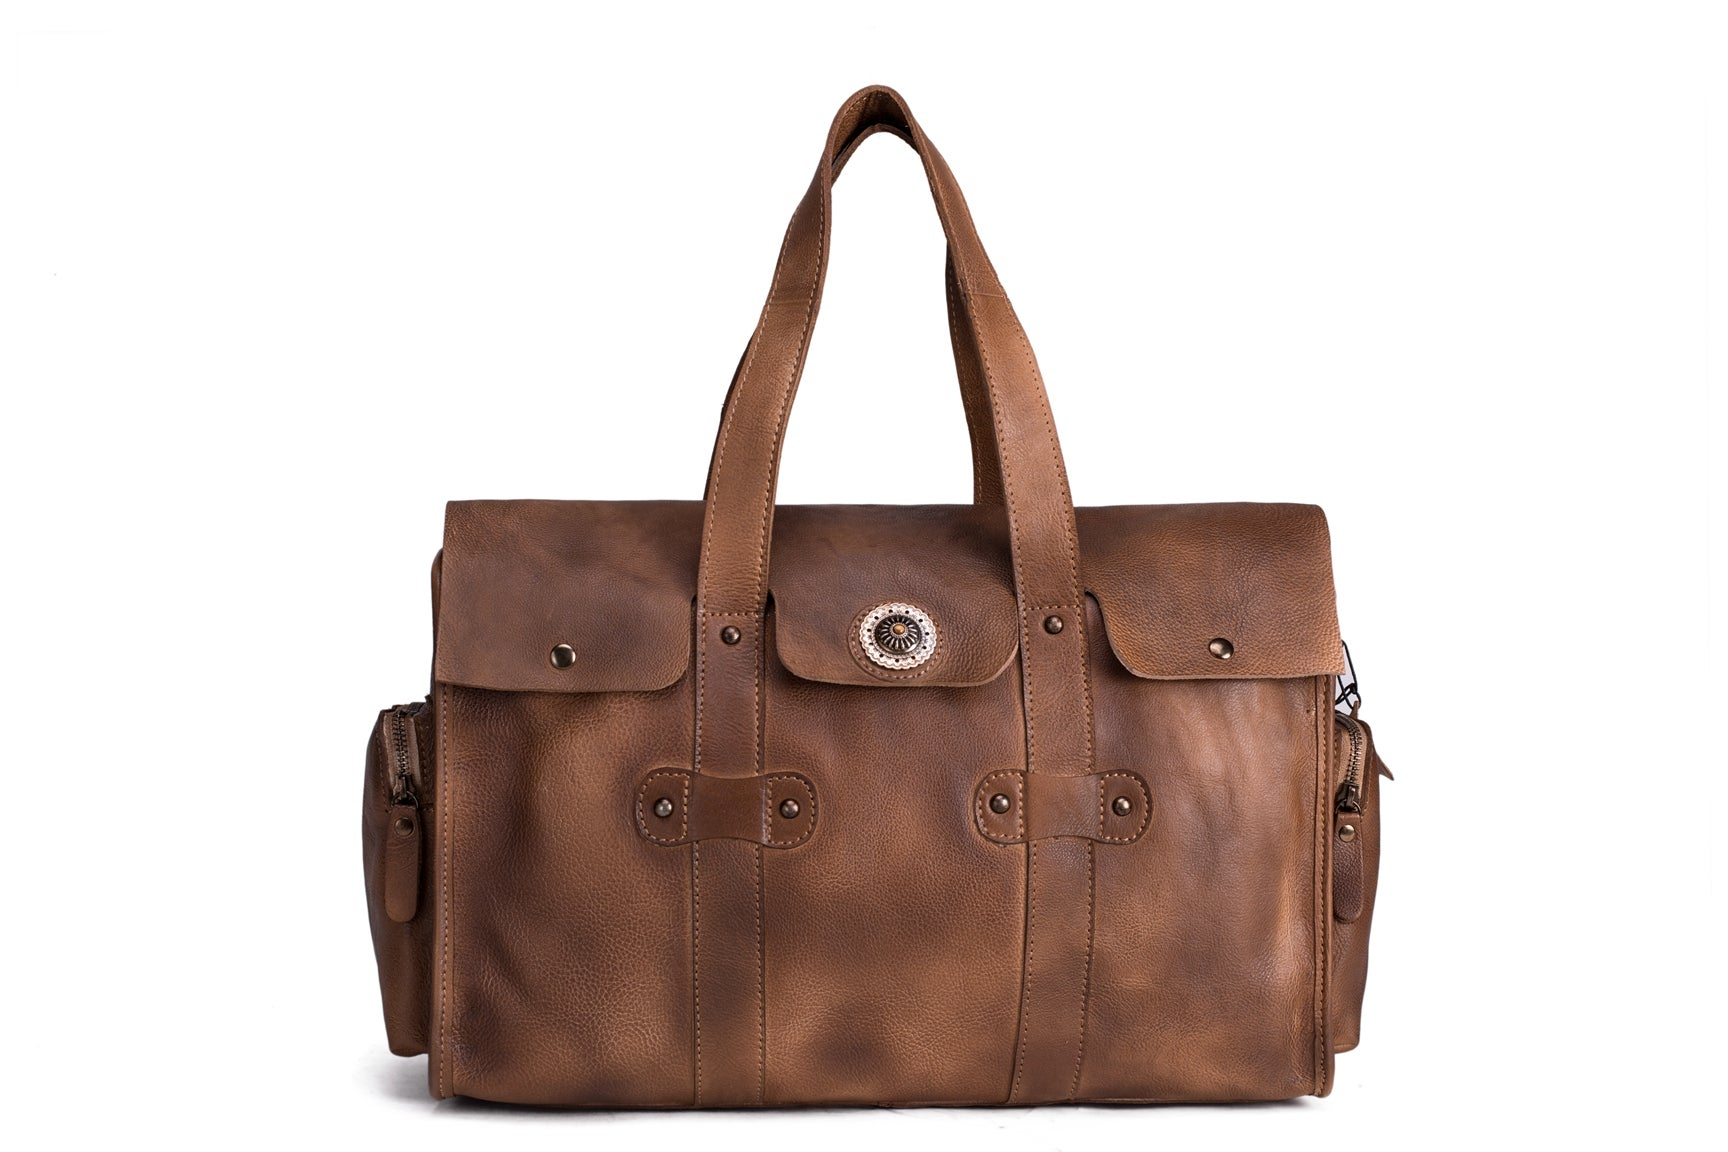 0acda30dc9b0 MoshiLeatherBag - Handmade Leather Bag Manufacturer — Handmade Vegetable  Tanned Leather Travel Bag